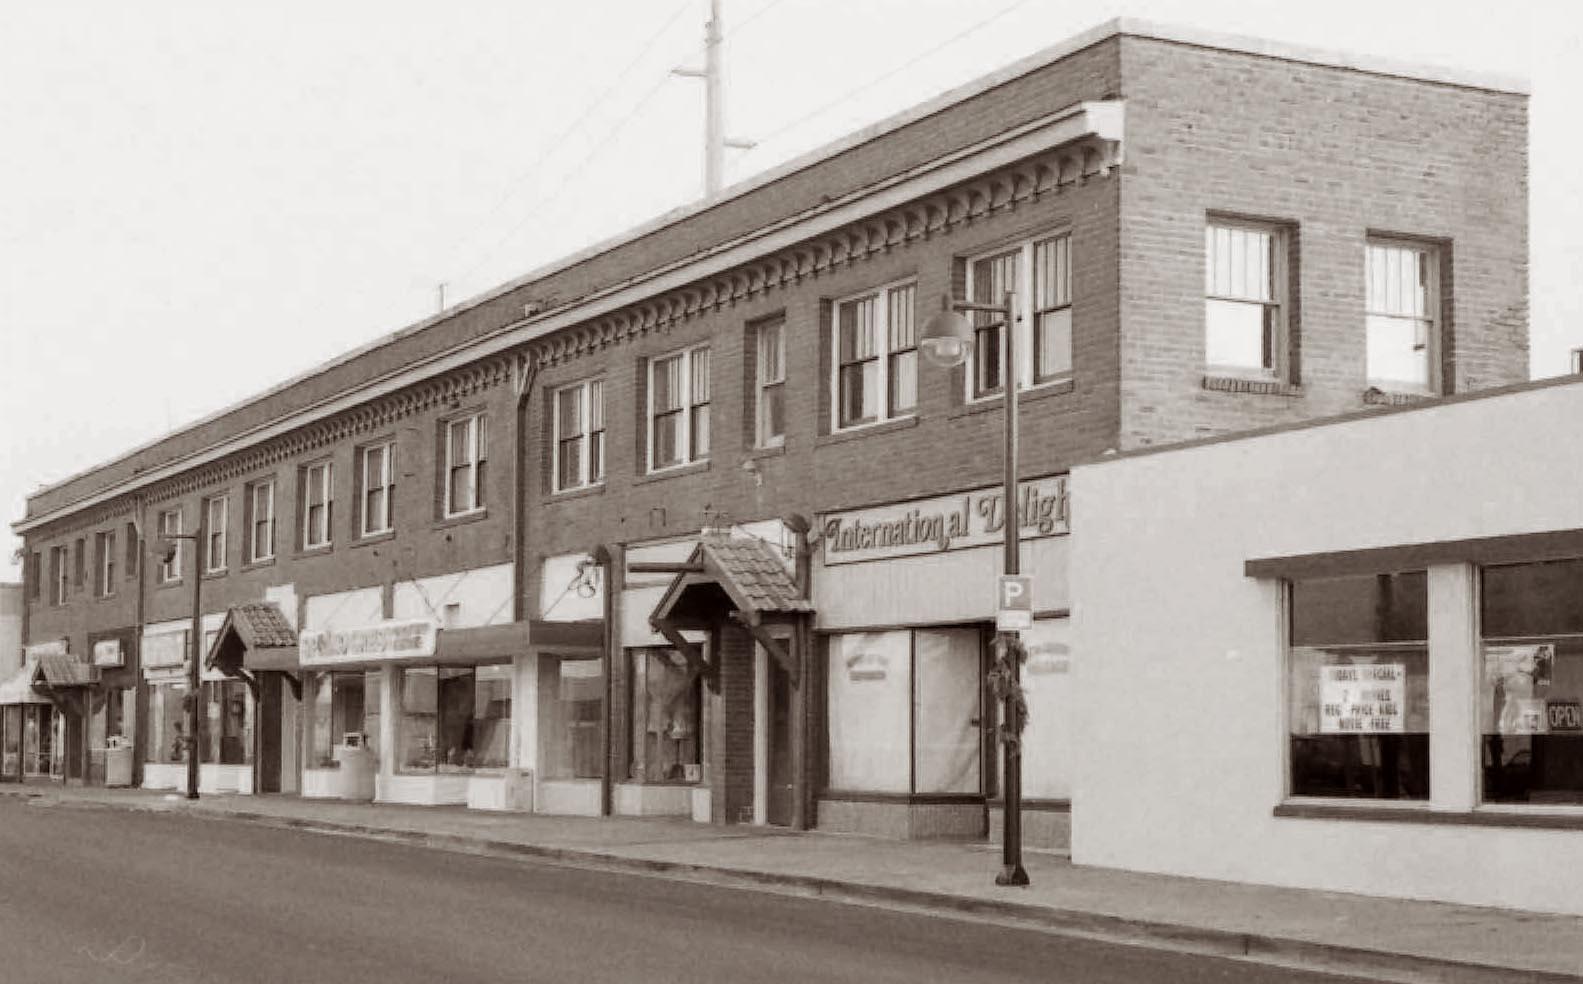 City Of Beaverton Planning And Zoning Corridor Designation